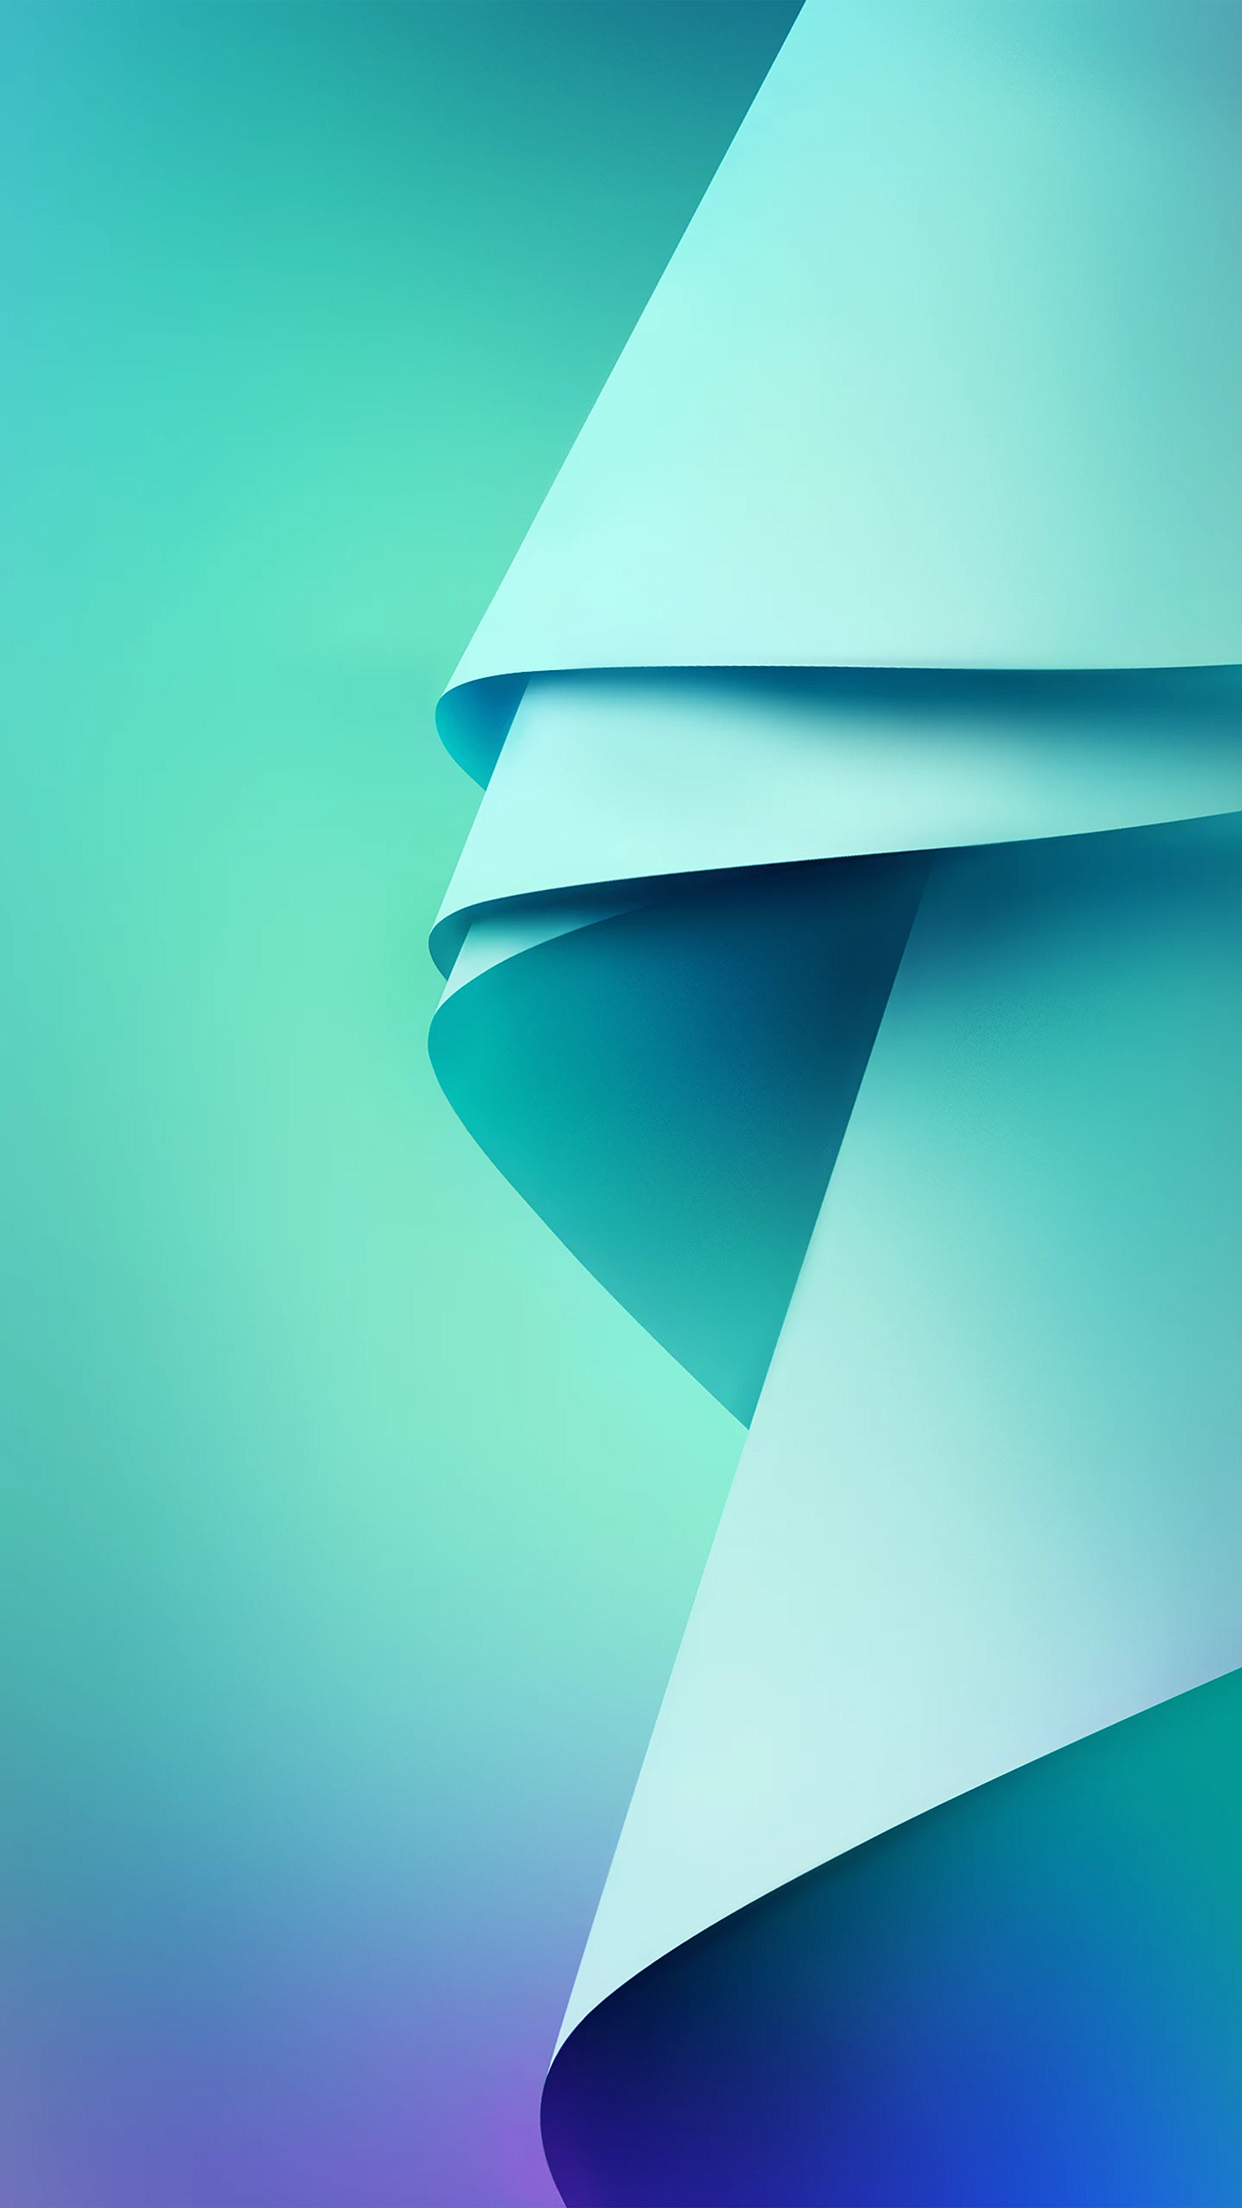 Blue And Green Living Room Ideas: Vm59-blue-green-abstract-pattern-wallpaper